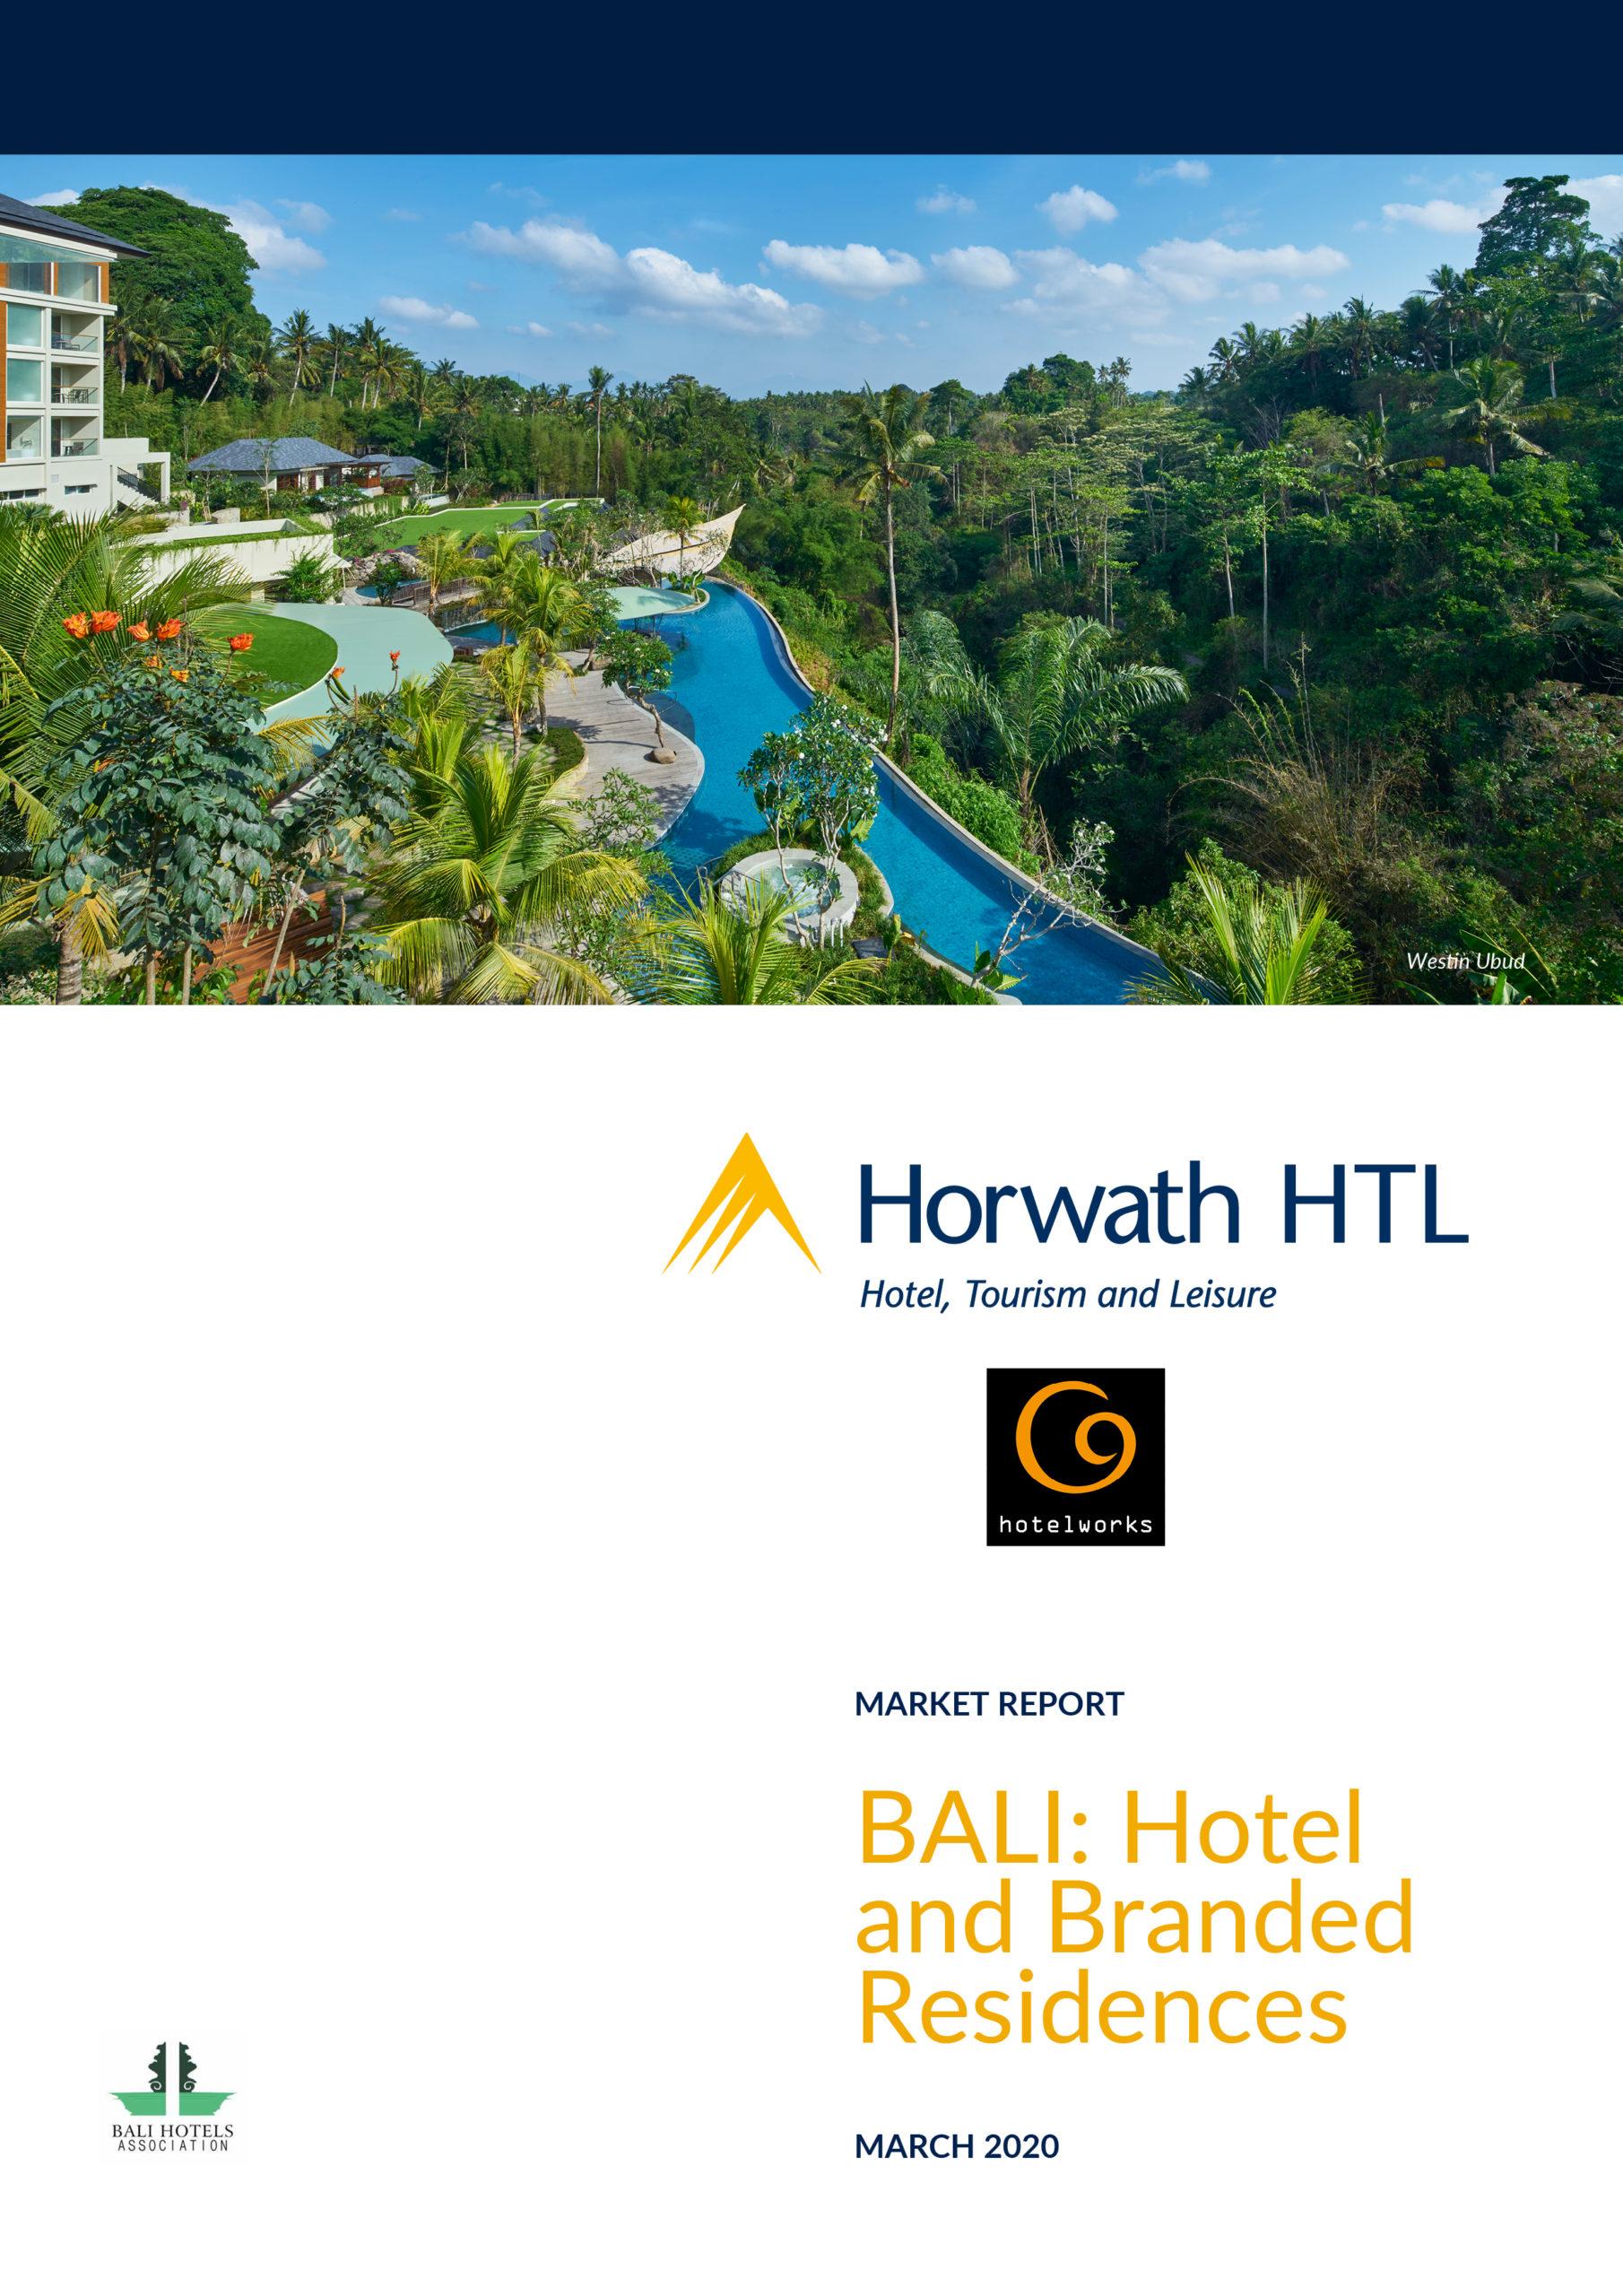 Market Report BALI Hotel Branded Residences